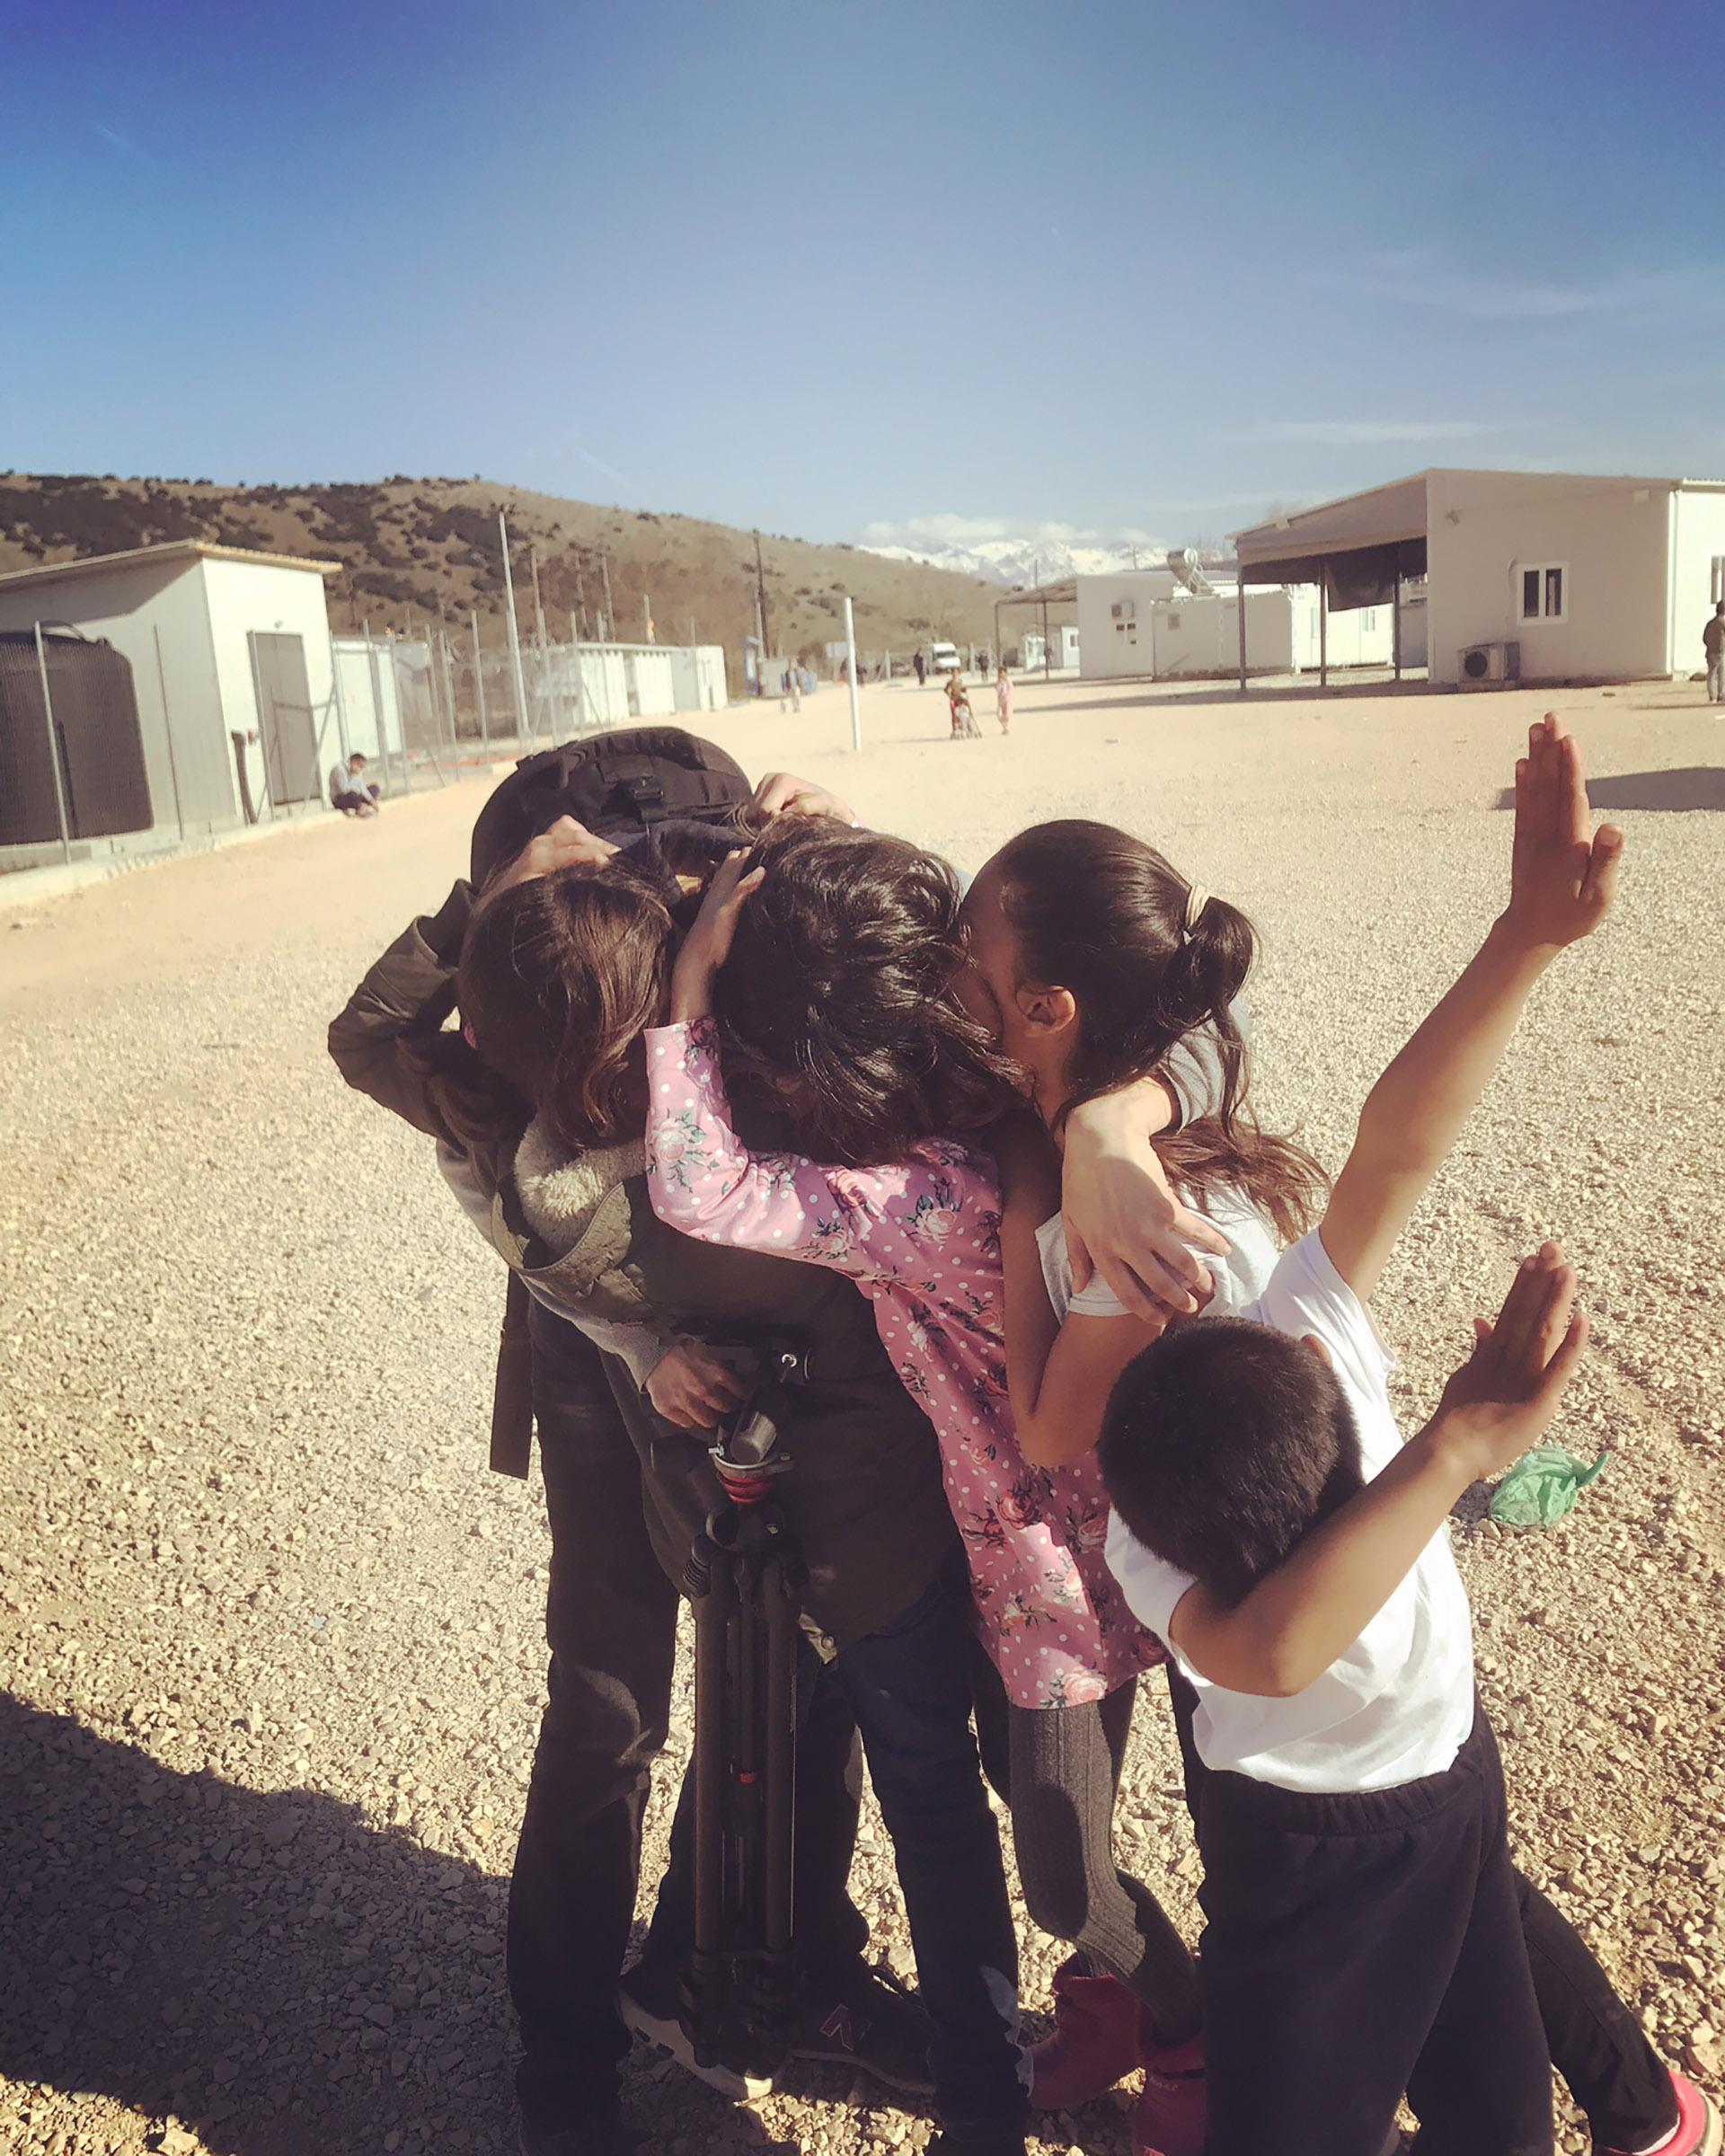 Children hugging photographer Anna Bosch Miralpeix in Katsikas camp in Greece in 2018.